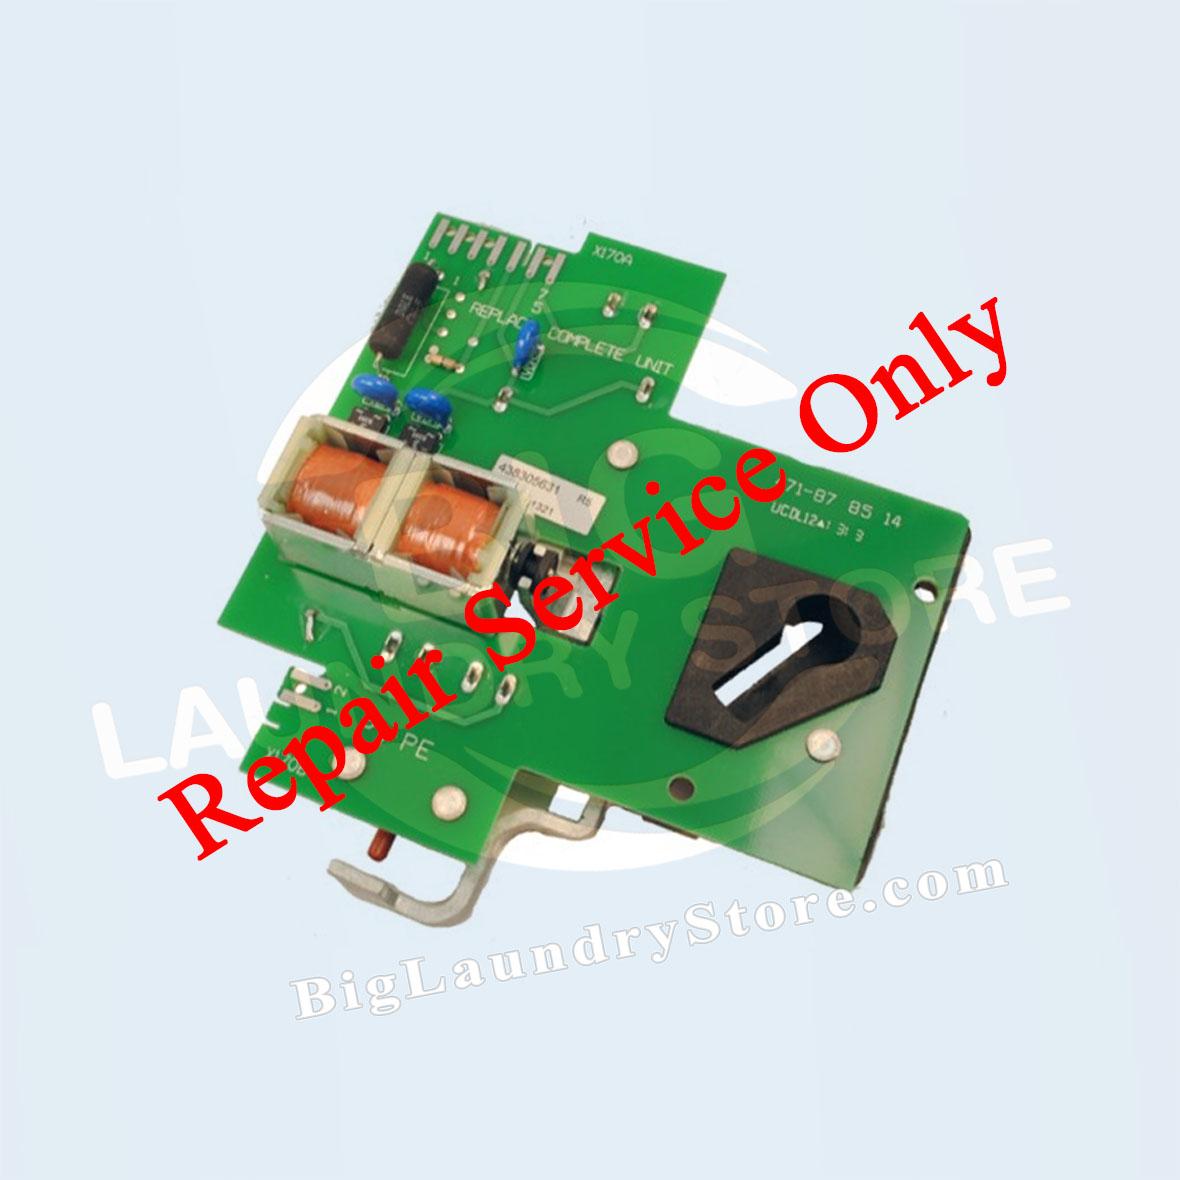 REPAIR - Wascomat Generation 5 220V Door Lock # 305632, 878514 Repair